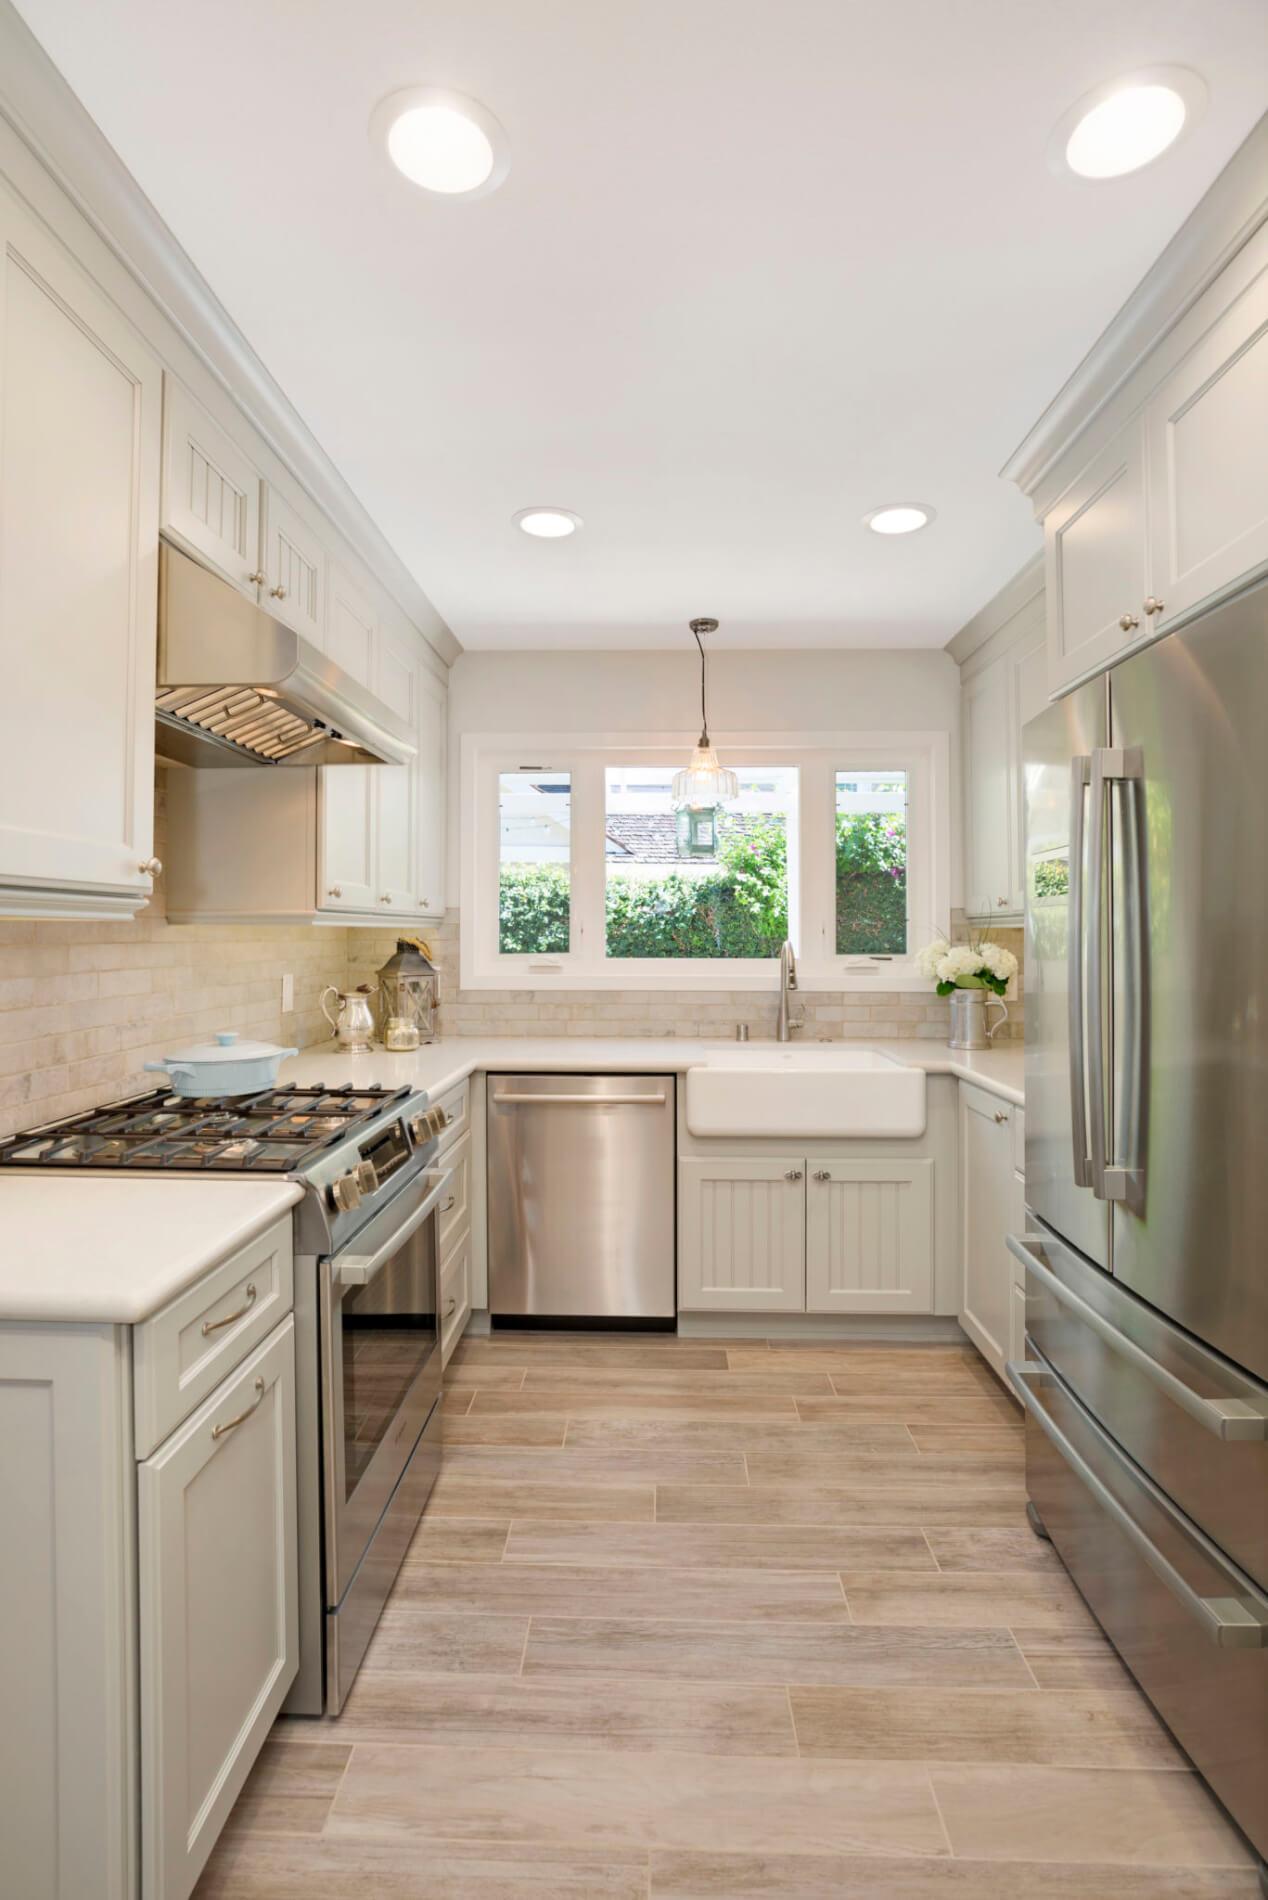 light blue kitchen cabinetry with farmhouse sink and whitewash brick backsplash